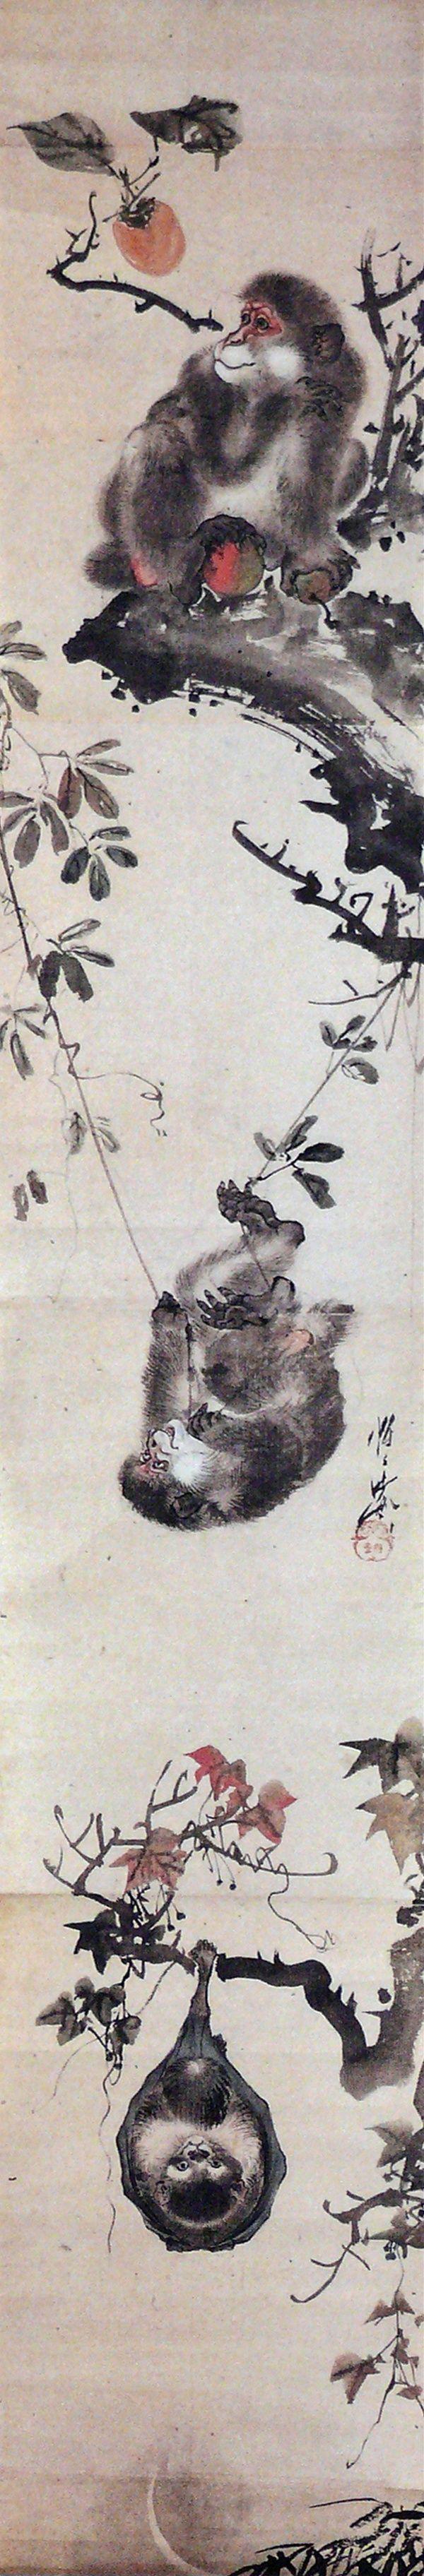 KAWANABE Kyosai 1878, Japan http://www.muian.com/muian04/04kyosai10797.jpg